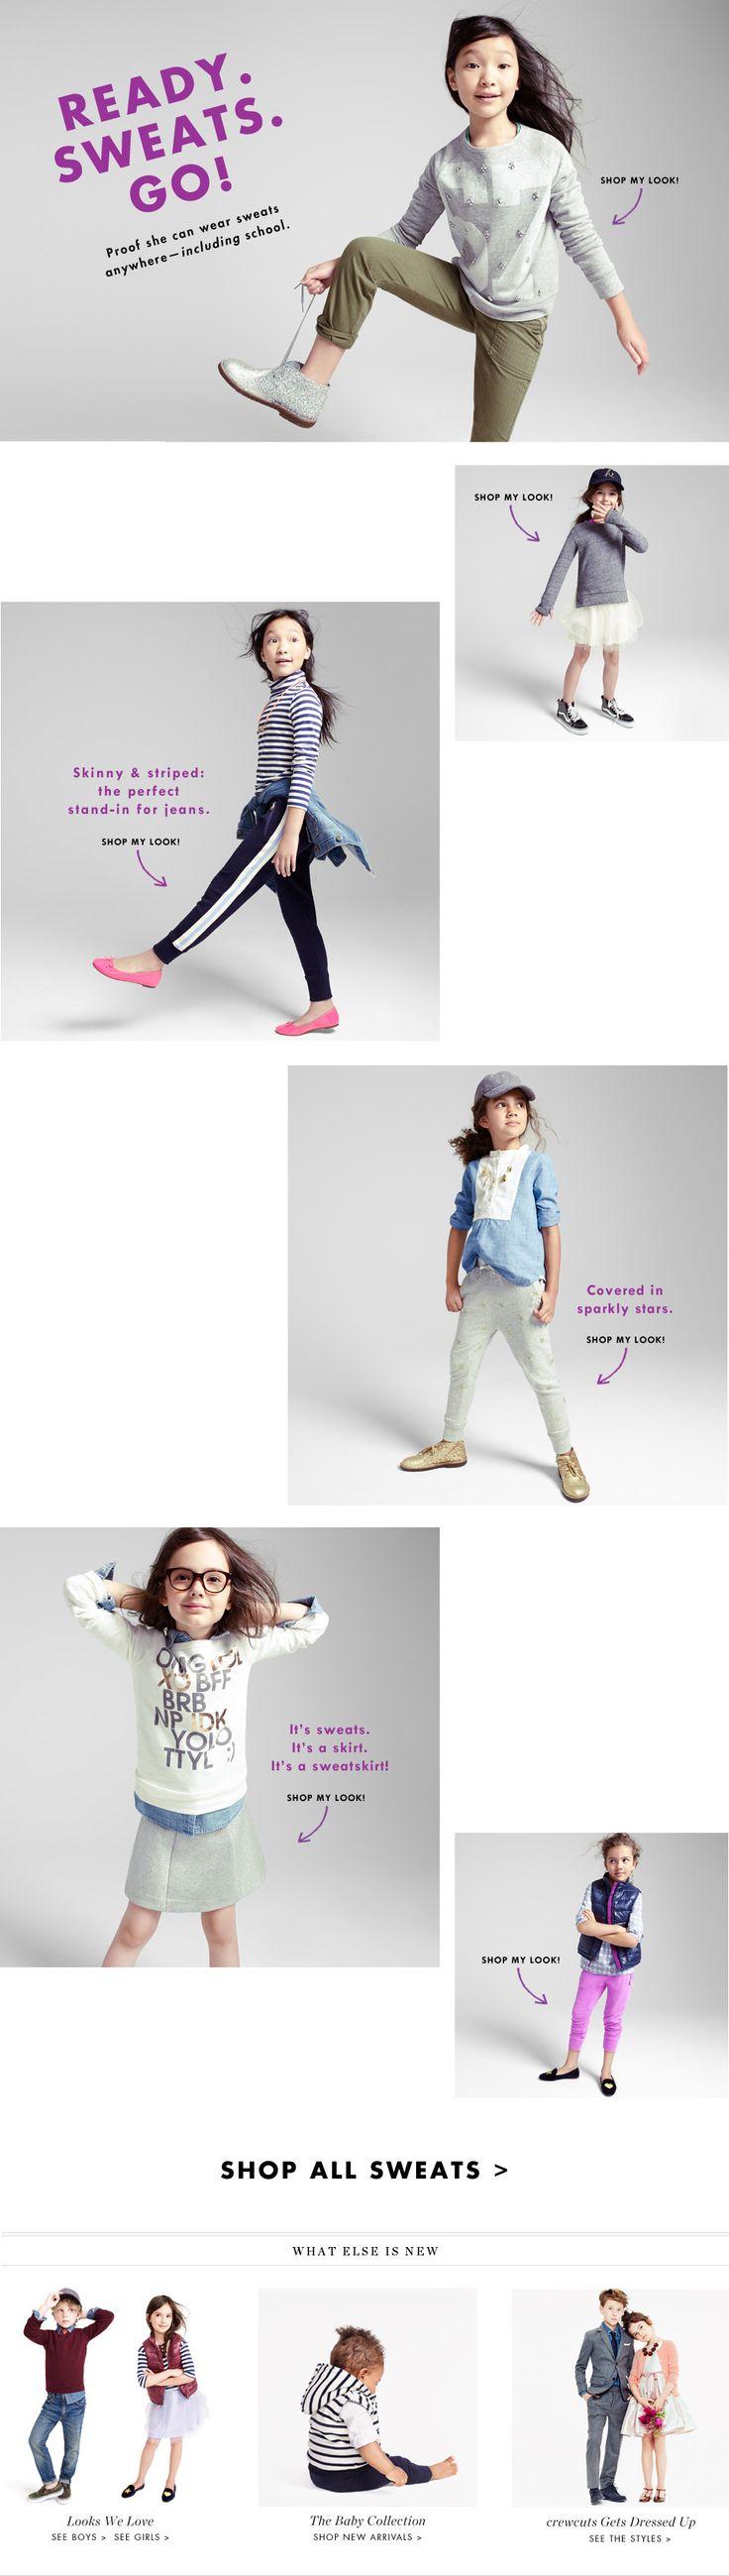 Girls' Clothing, Fashion & Apparel : Ready. Sweats. Go! | J.Crew